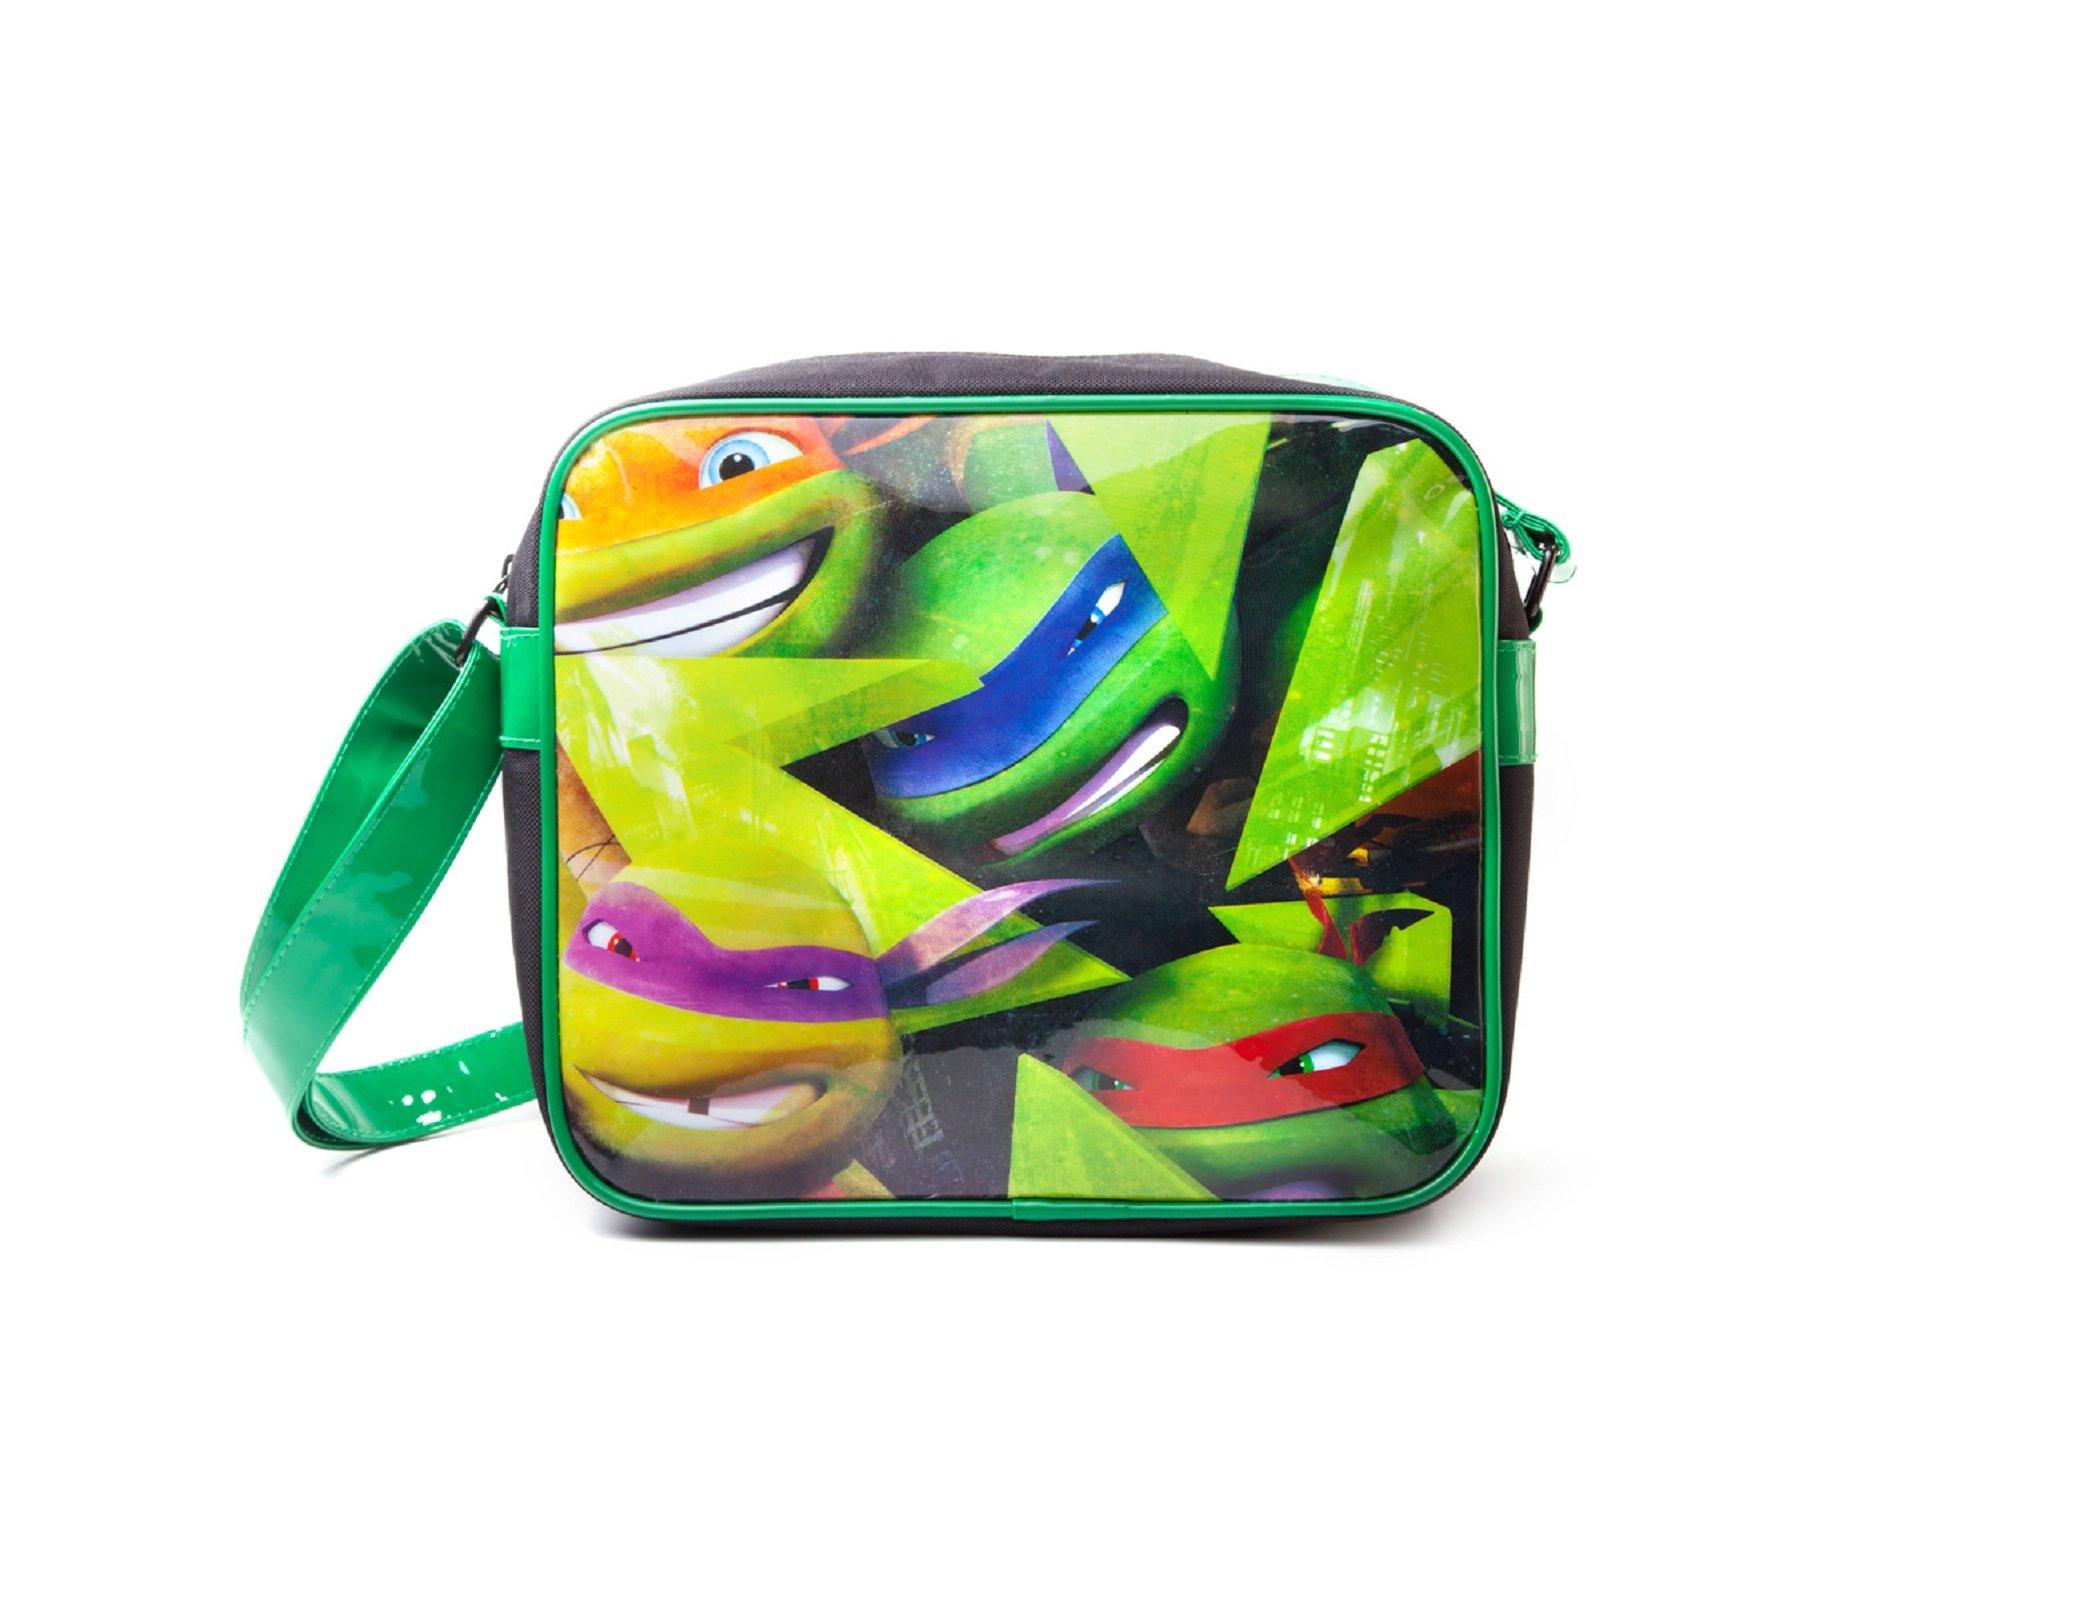 Teenage Mutant Ninja Turtles Faces Official Green Messenger Bag